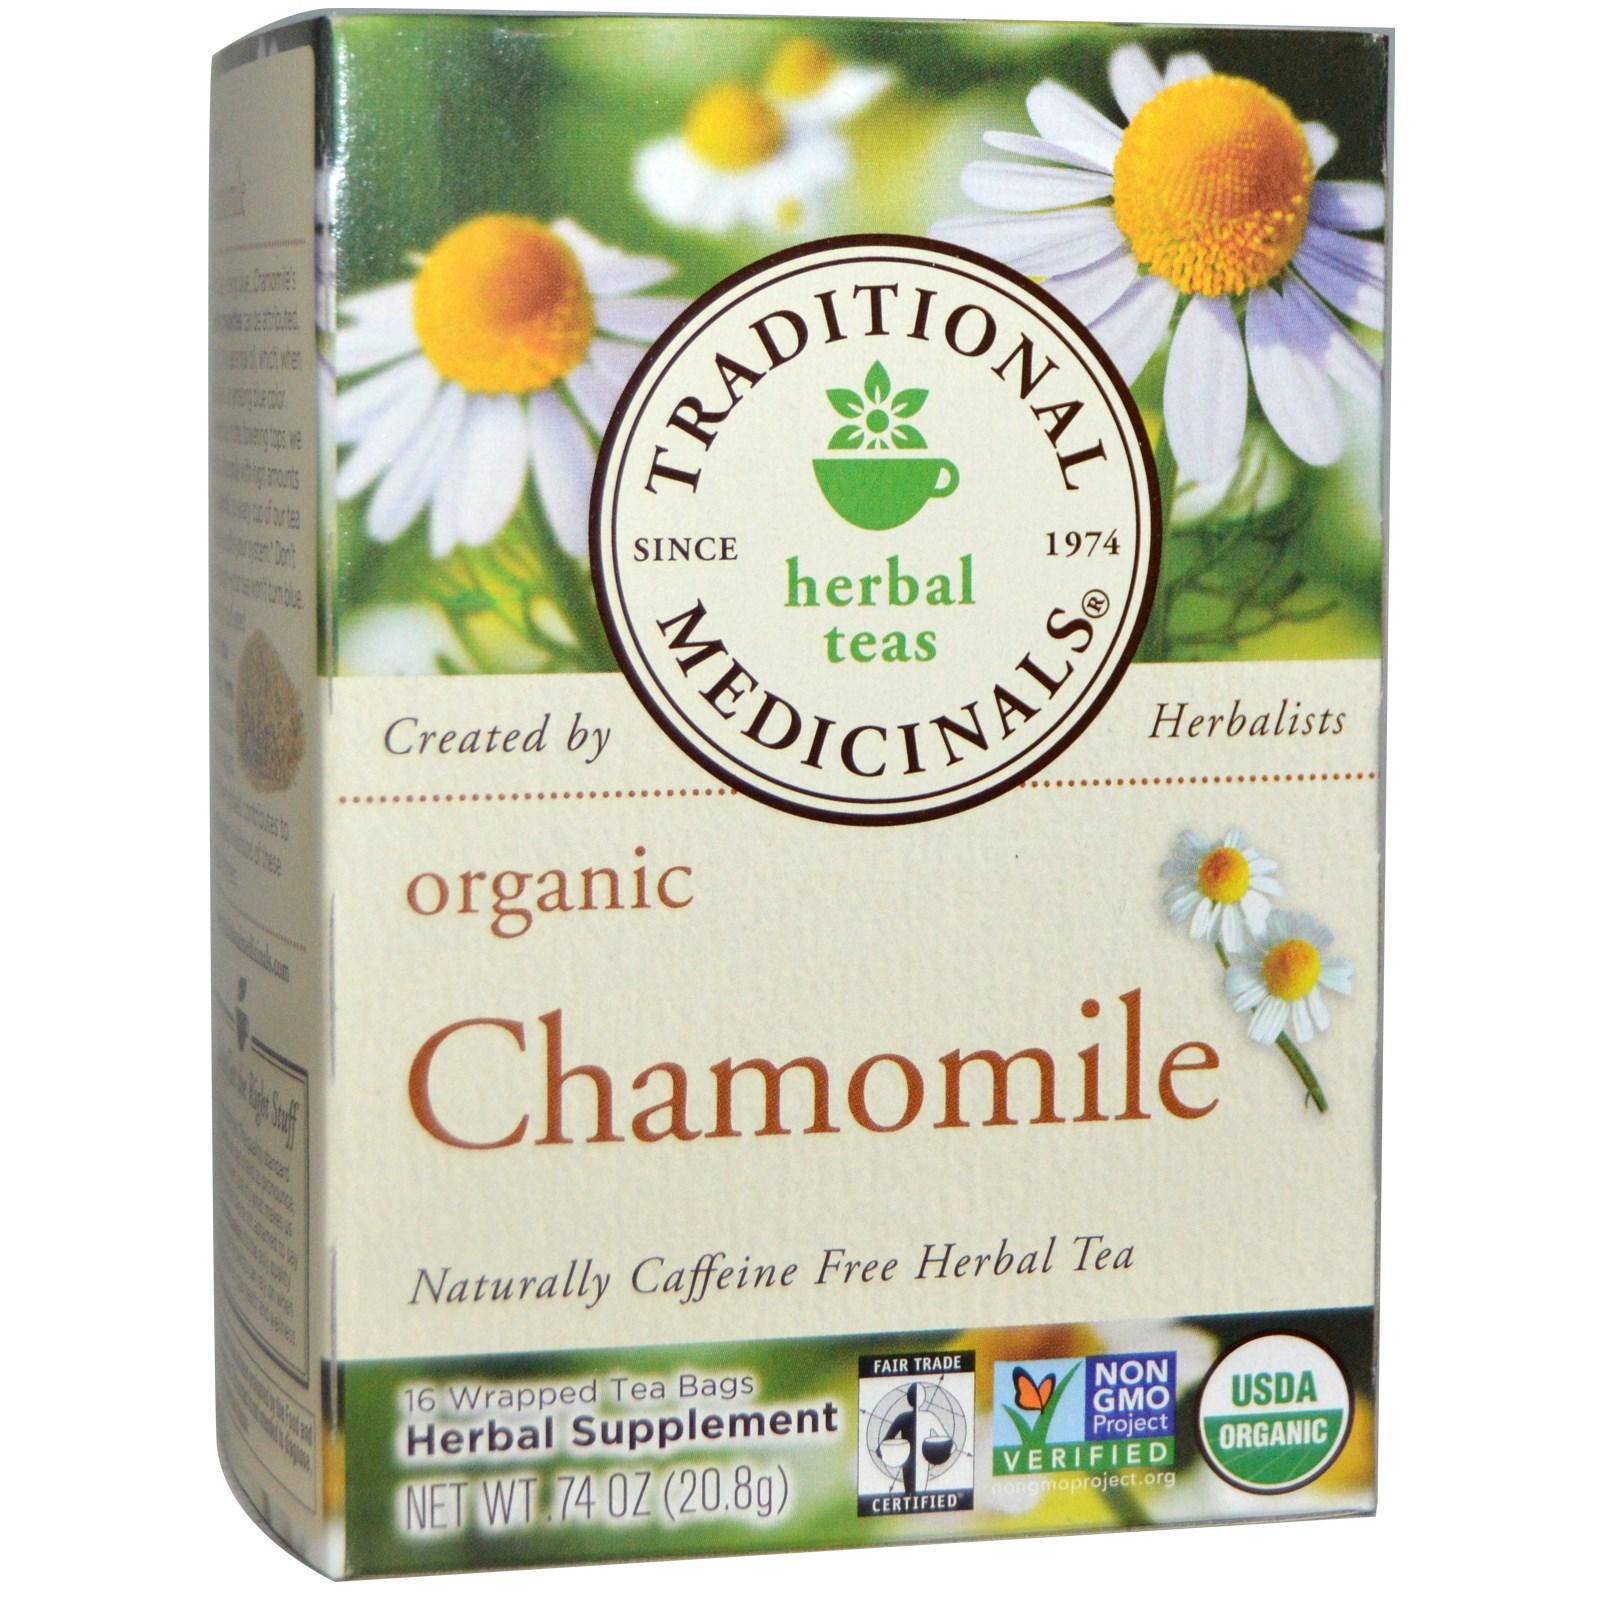 Traditional Medicinals, Herbal Teas, Organic Chamomile, Caffeine.